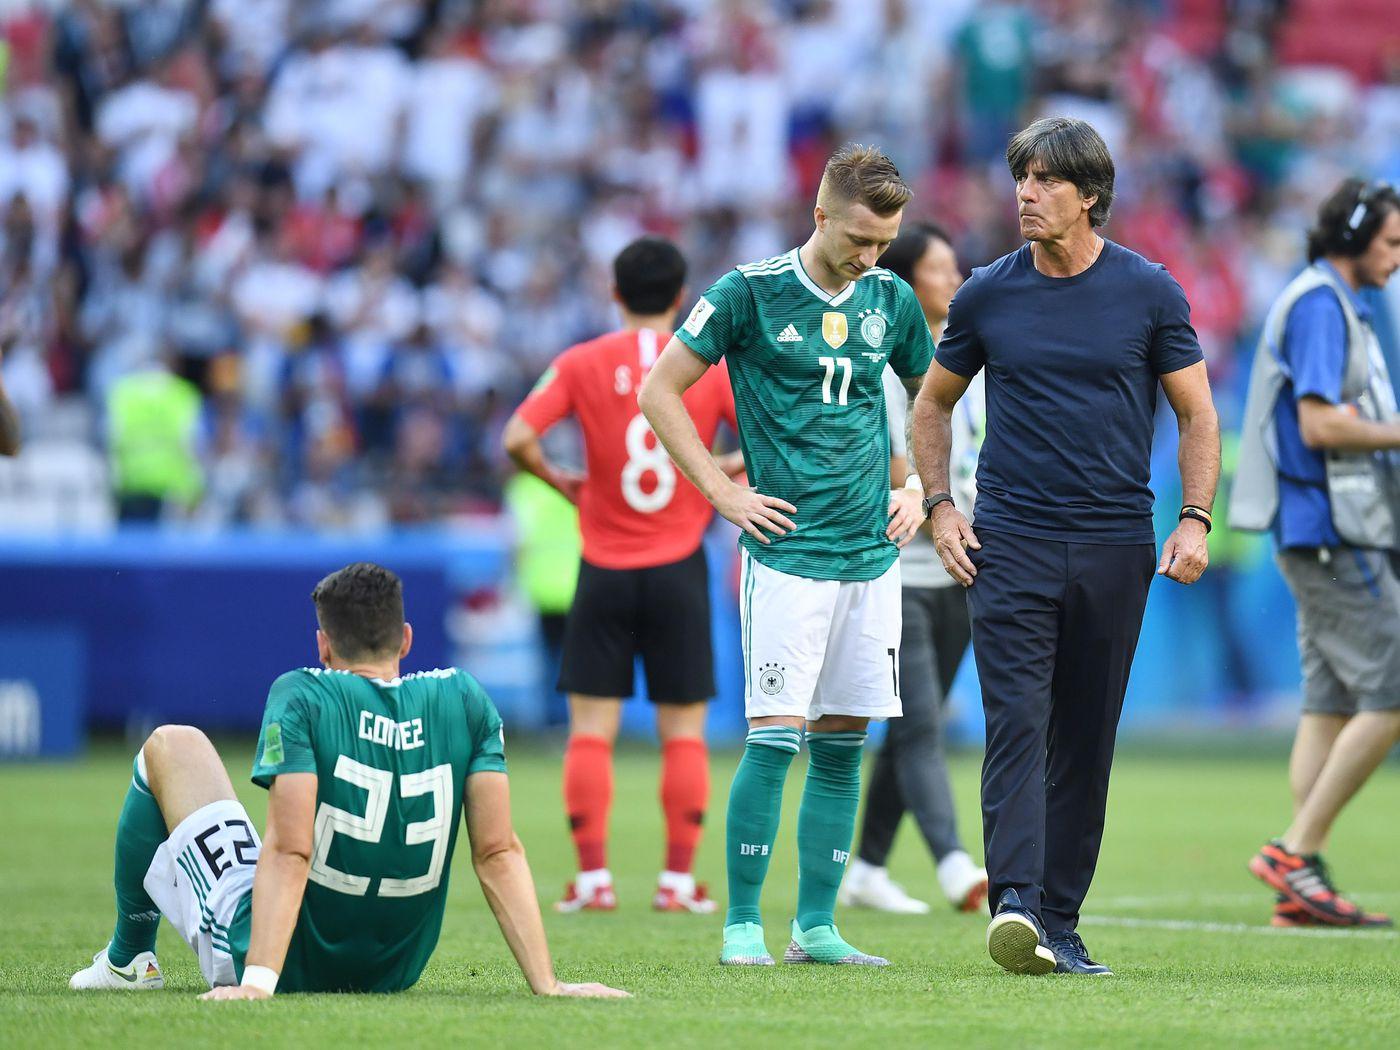 d096eb1de Major Link Soccer  World Champs no more - Sounder At Heart